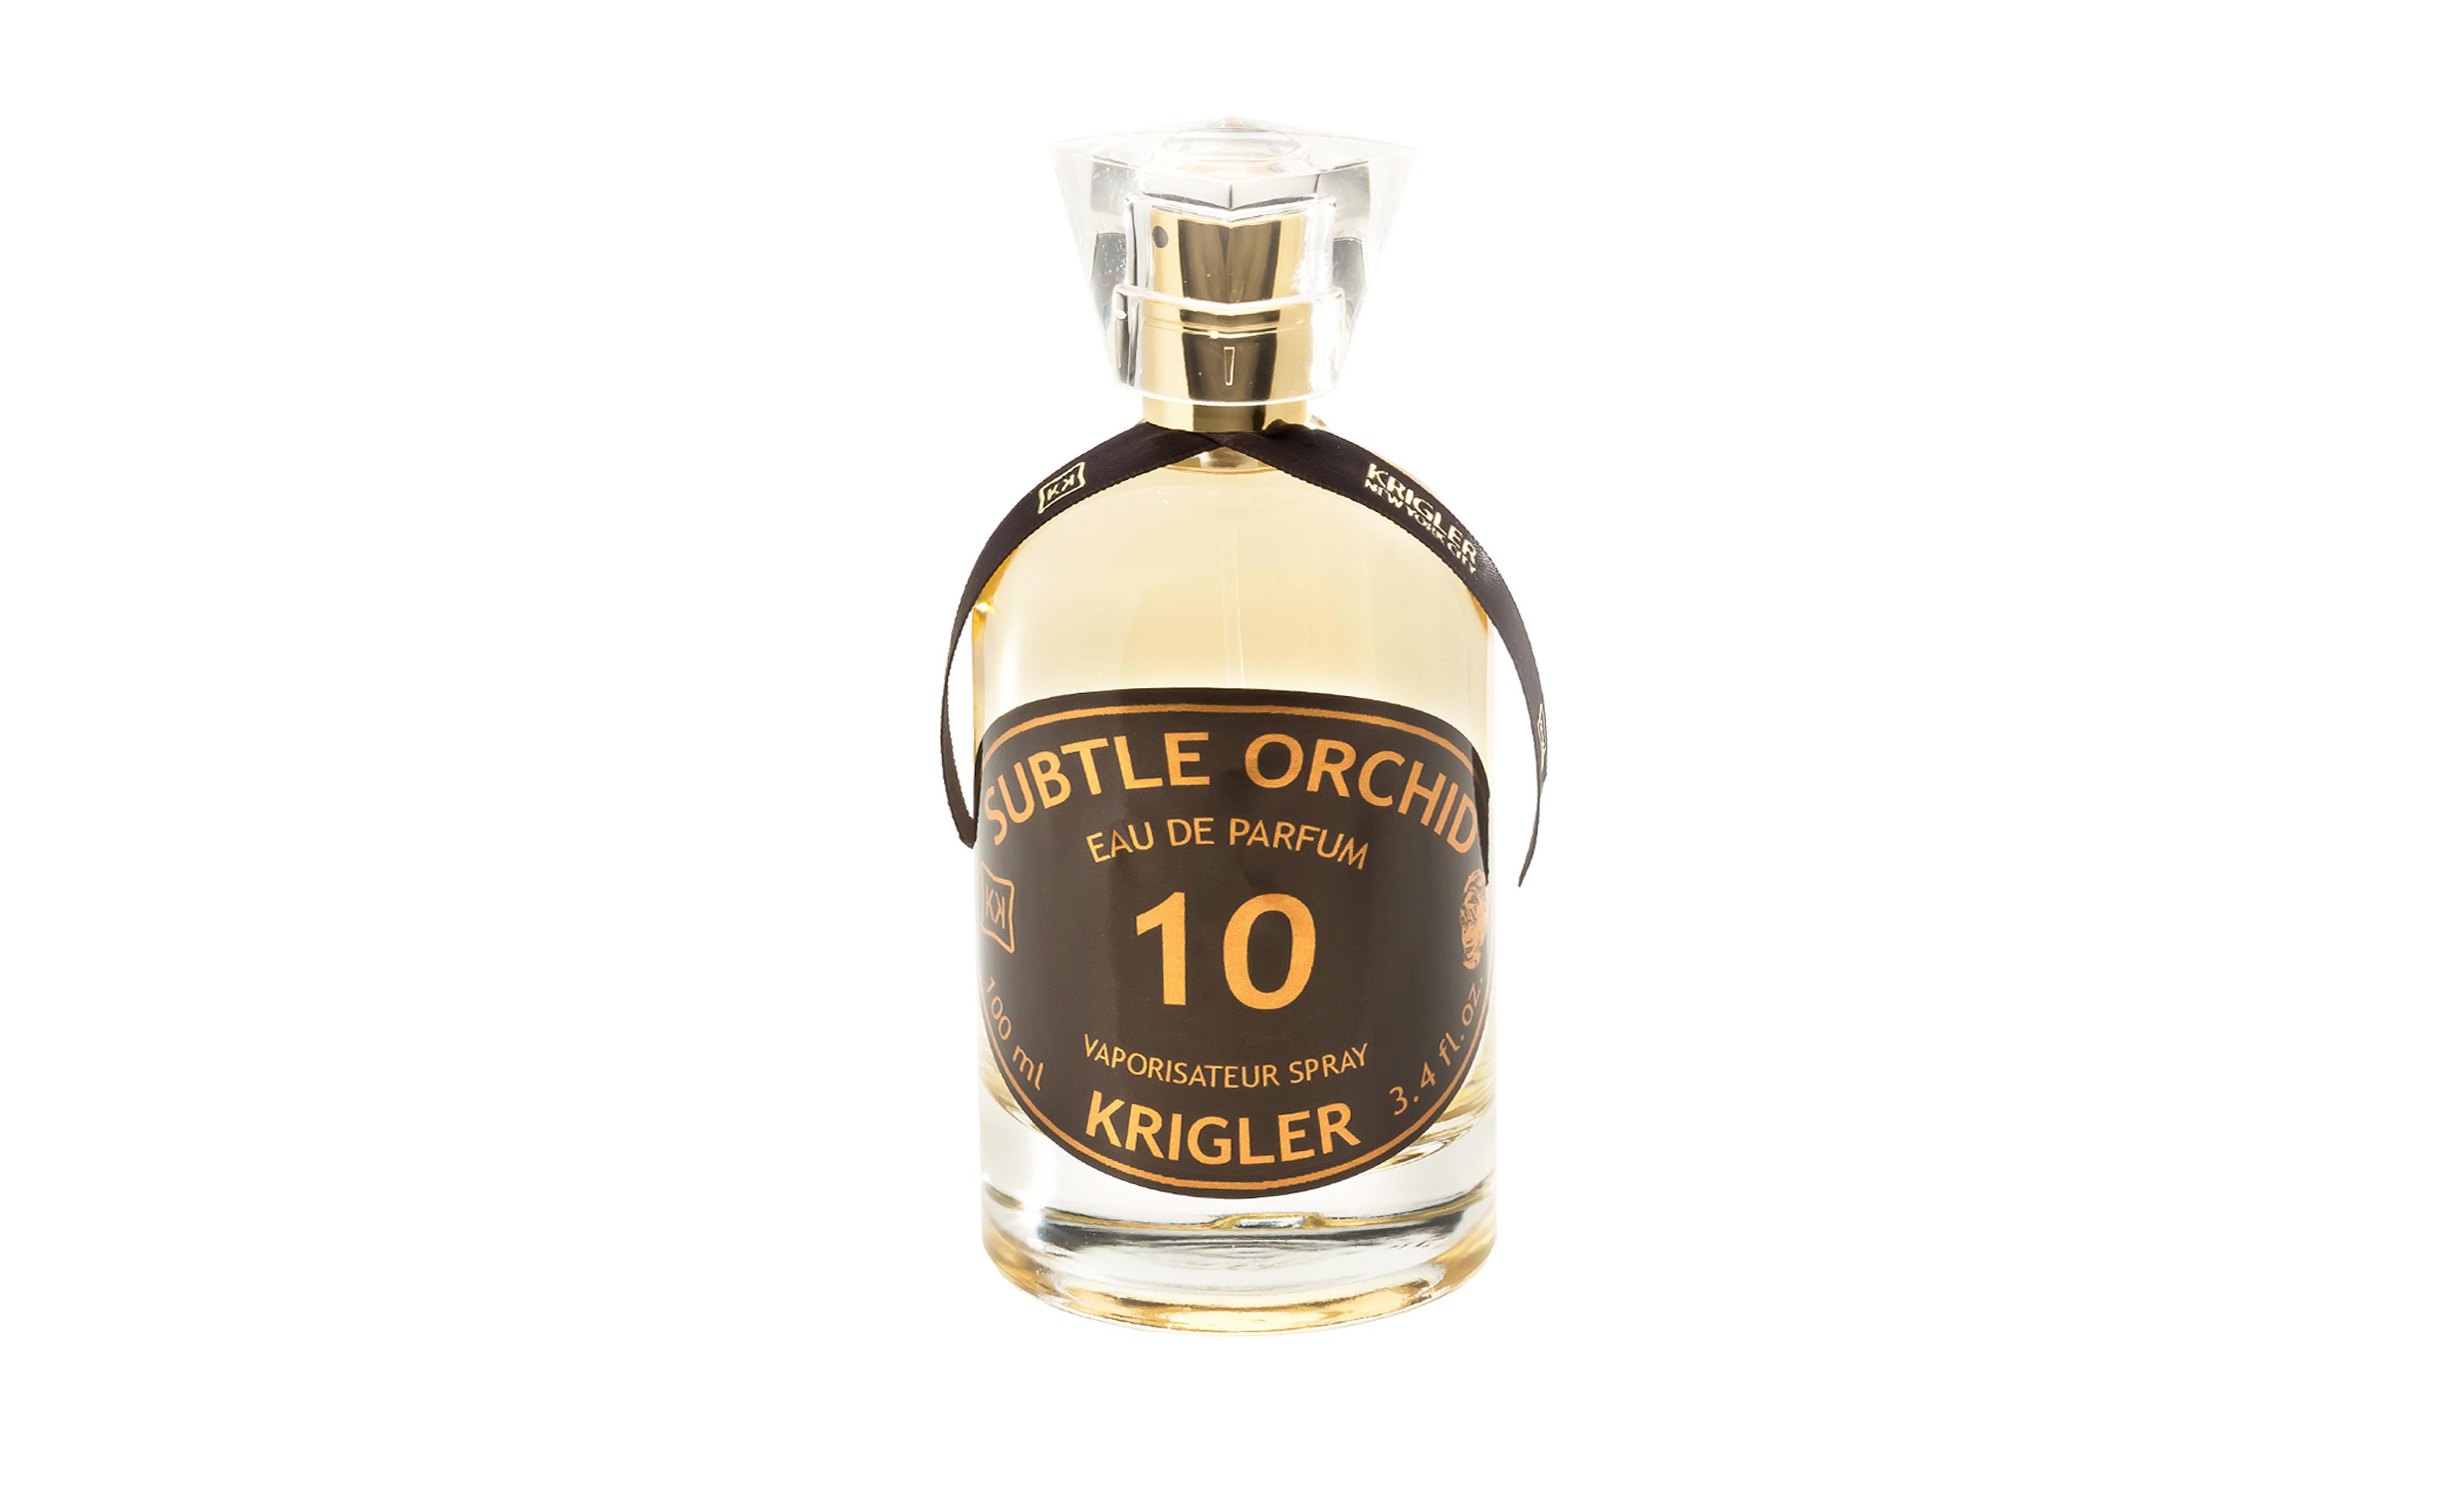 Krigler, fragancia, perfume, aroma, famosas, celebridades, lujo